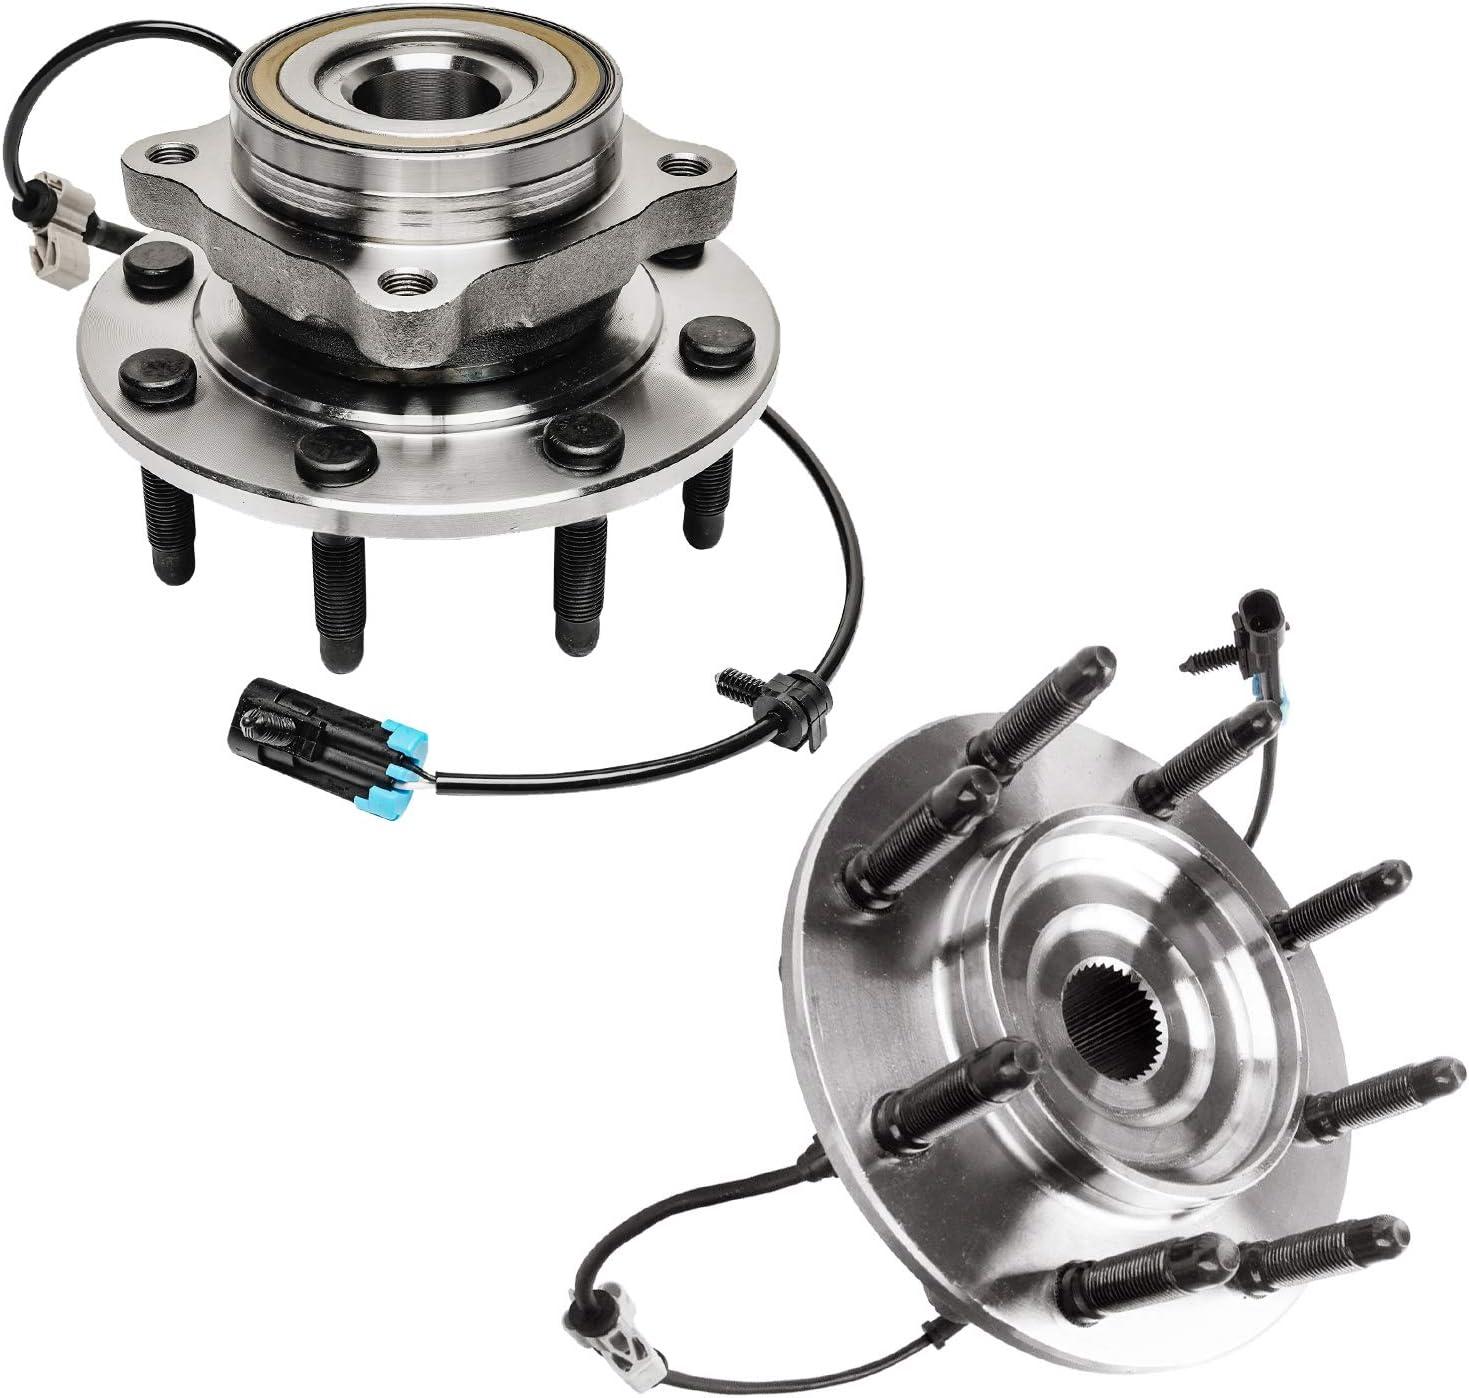 2 Front Wheel Bearing Hub Assembly 4x4 Chevy Silverado GMC Sierra 1500 2500 HD